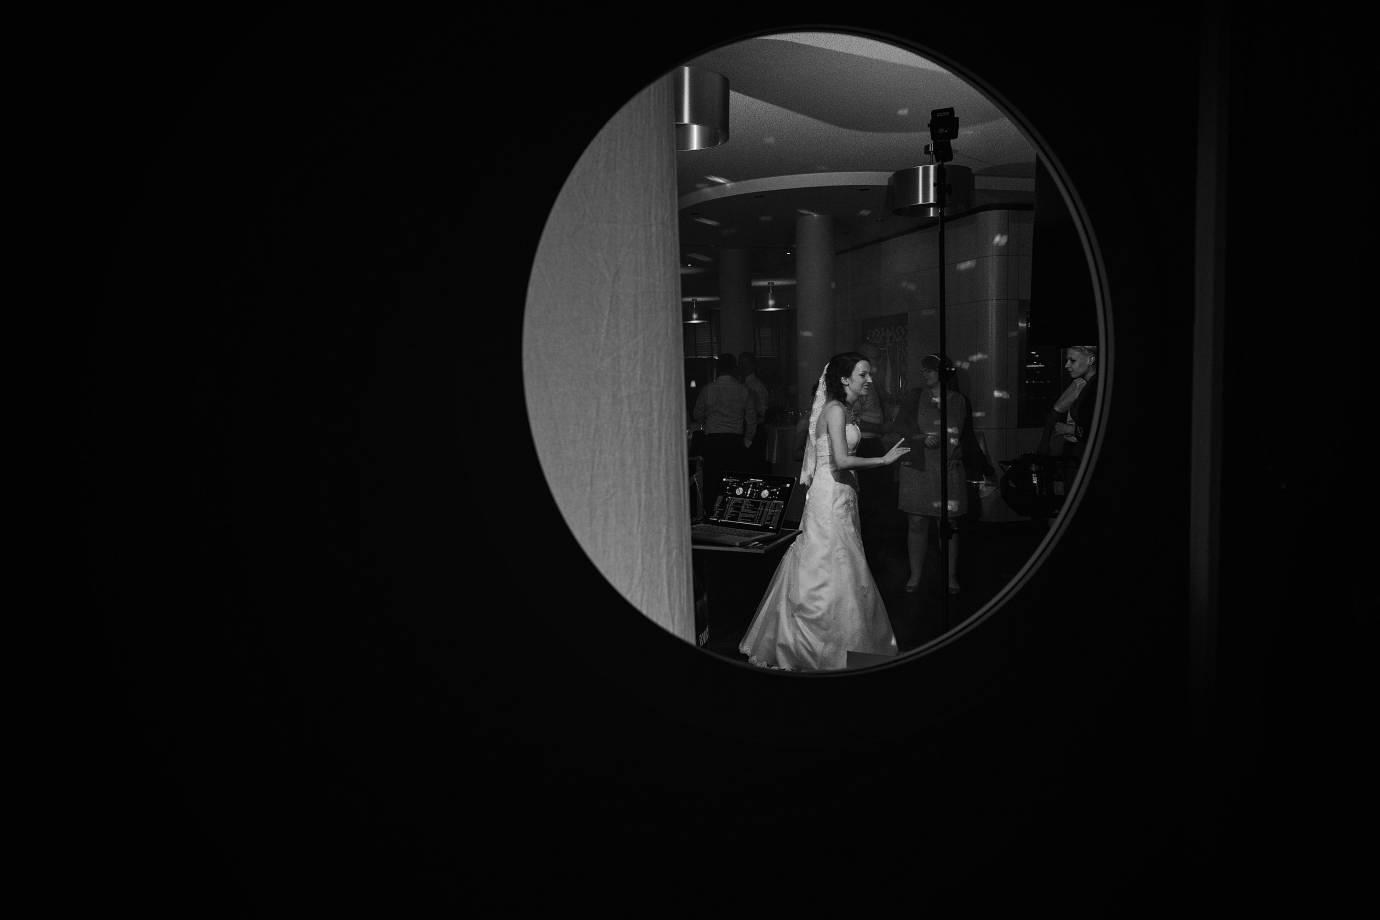 hochzeitsfotograf ohz 182 - Johanna+Sascha